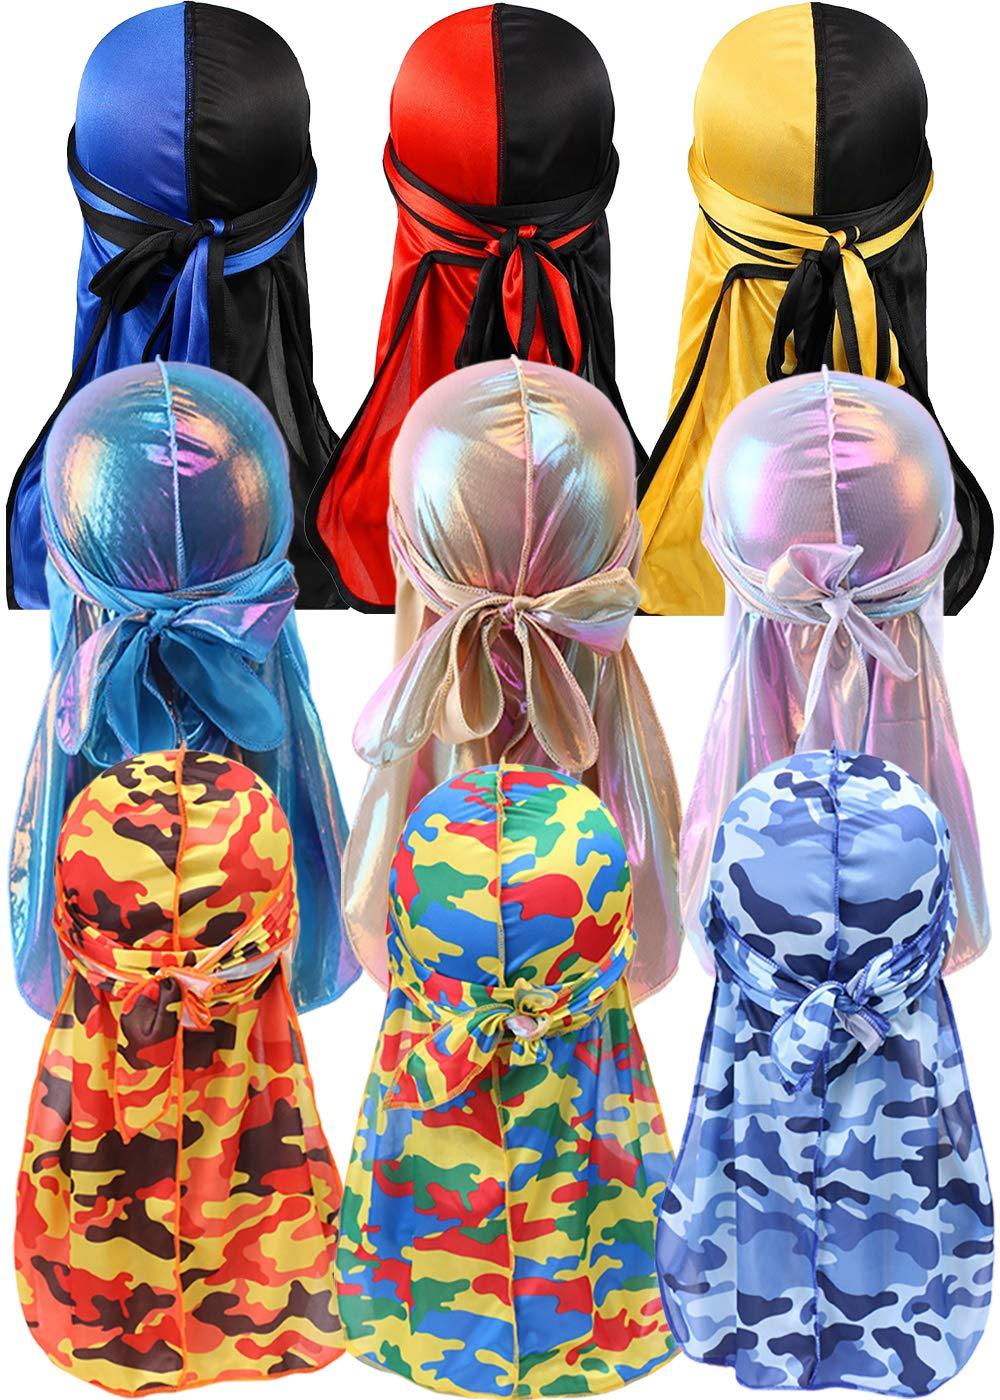 YI HENG MEI 2PCS/3PCS 360,540,720 Waves Color Block Silky Long Tail Durag Bandana Turban (9pcs/Set)